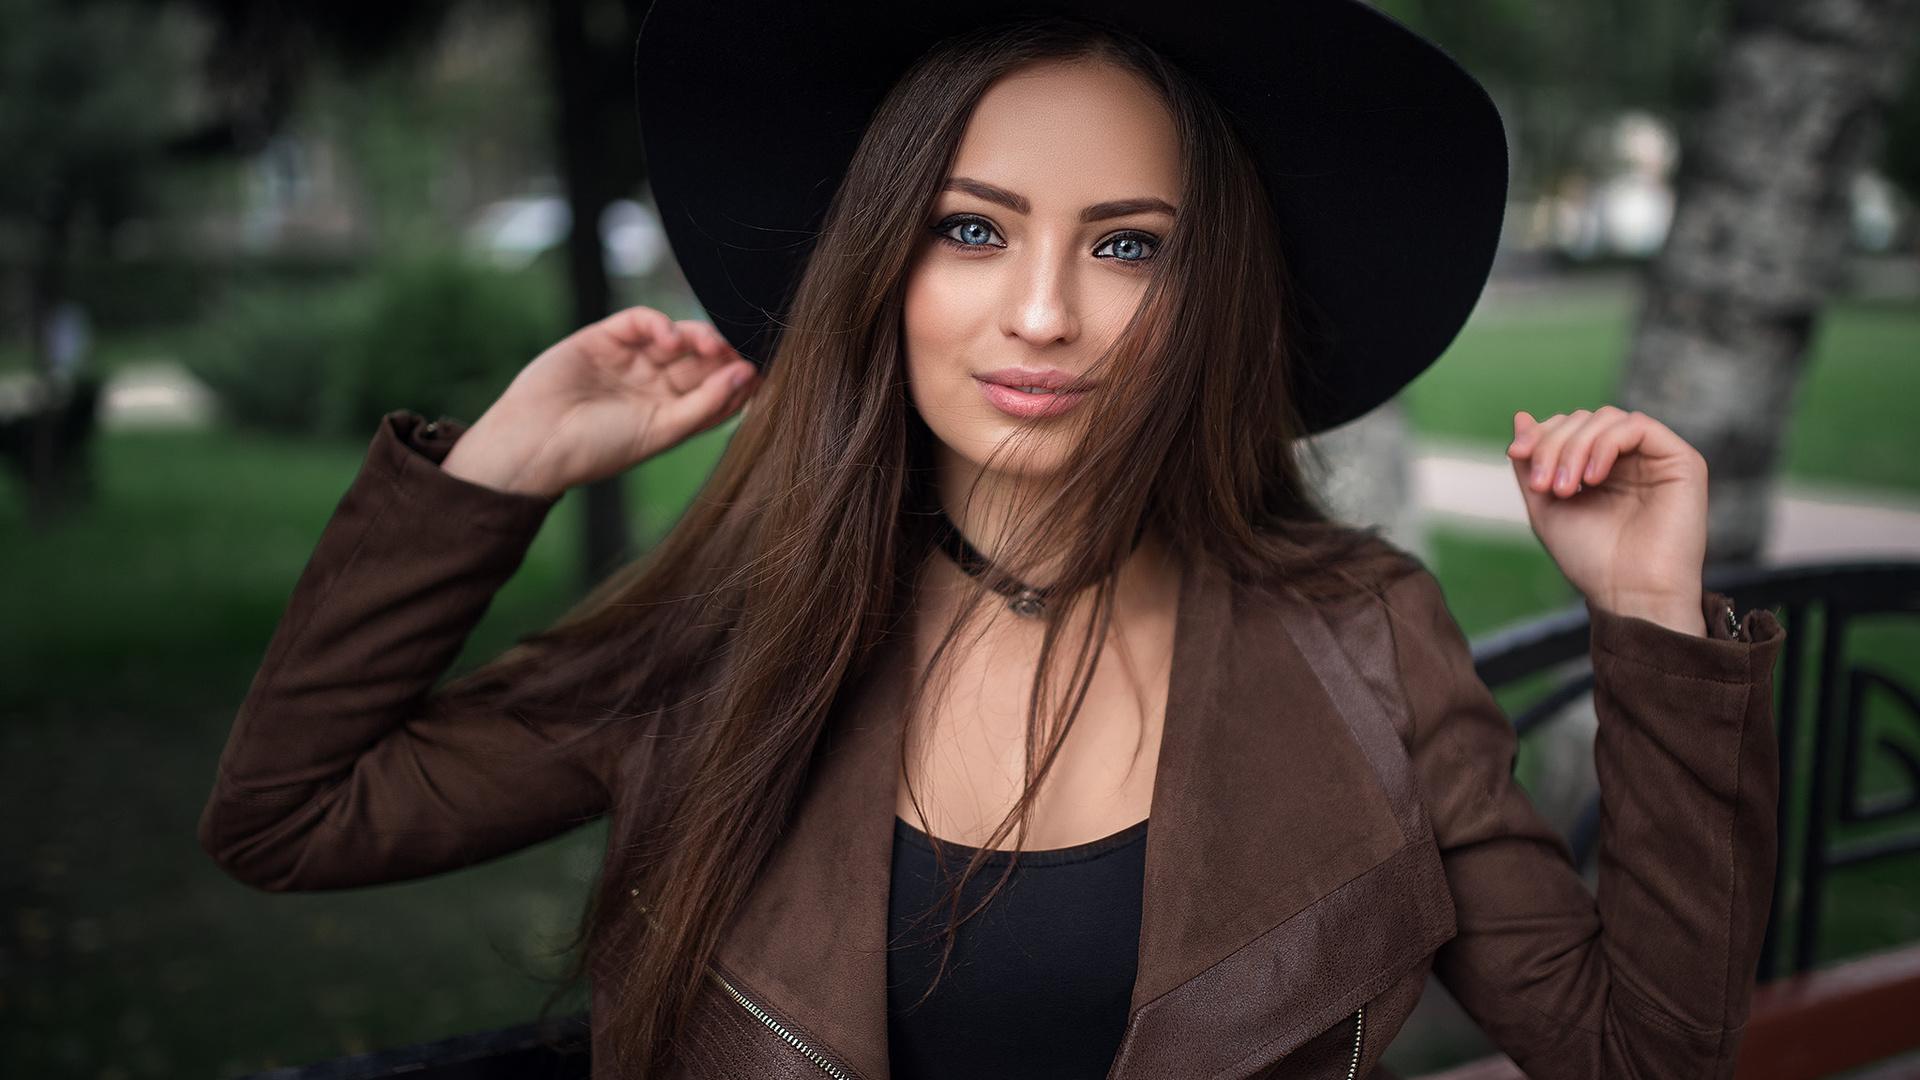 dmitry sn, photographer, девушка, модель